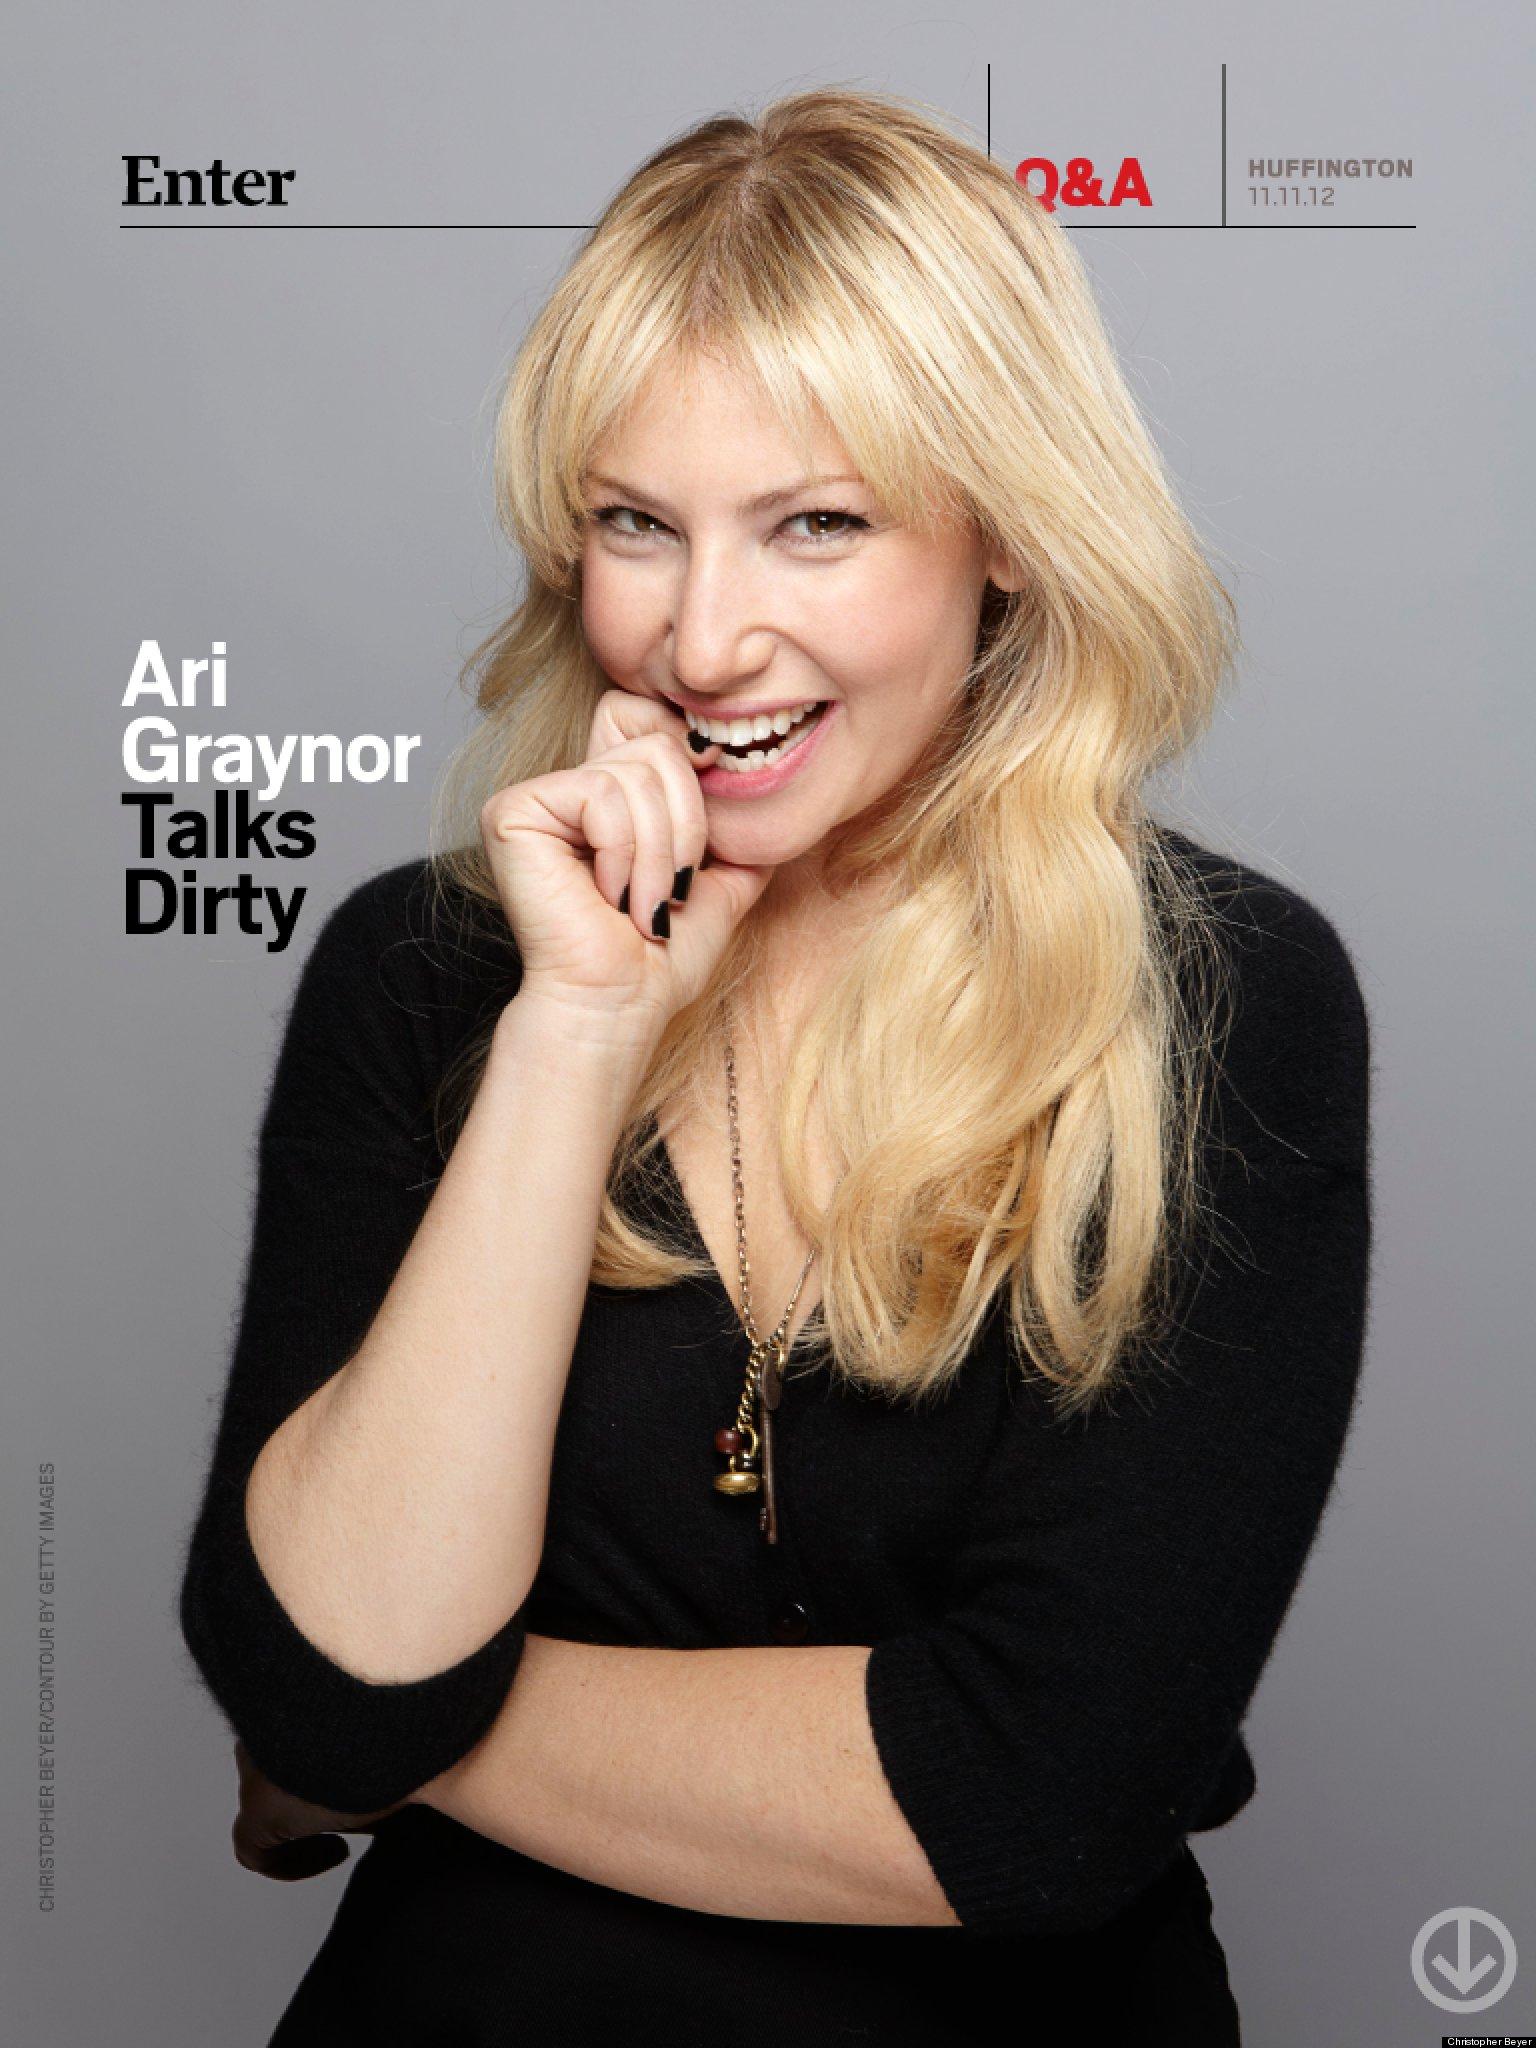 Ari Graynor